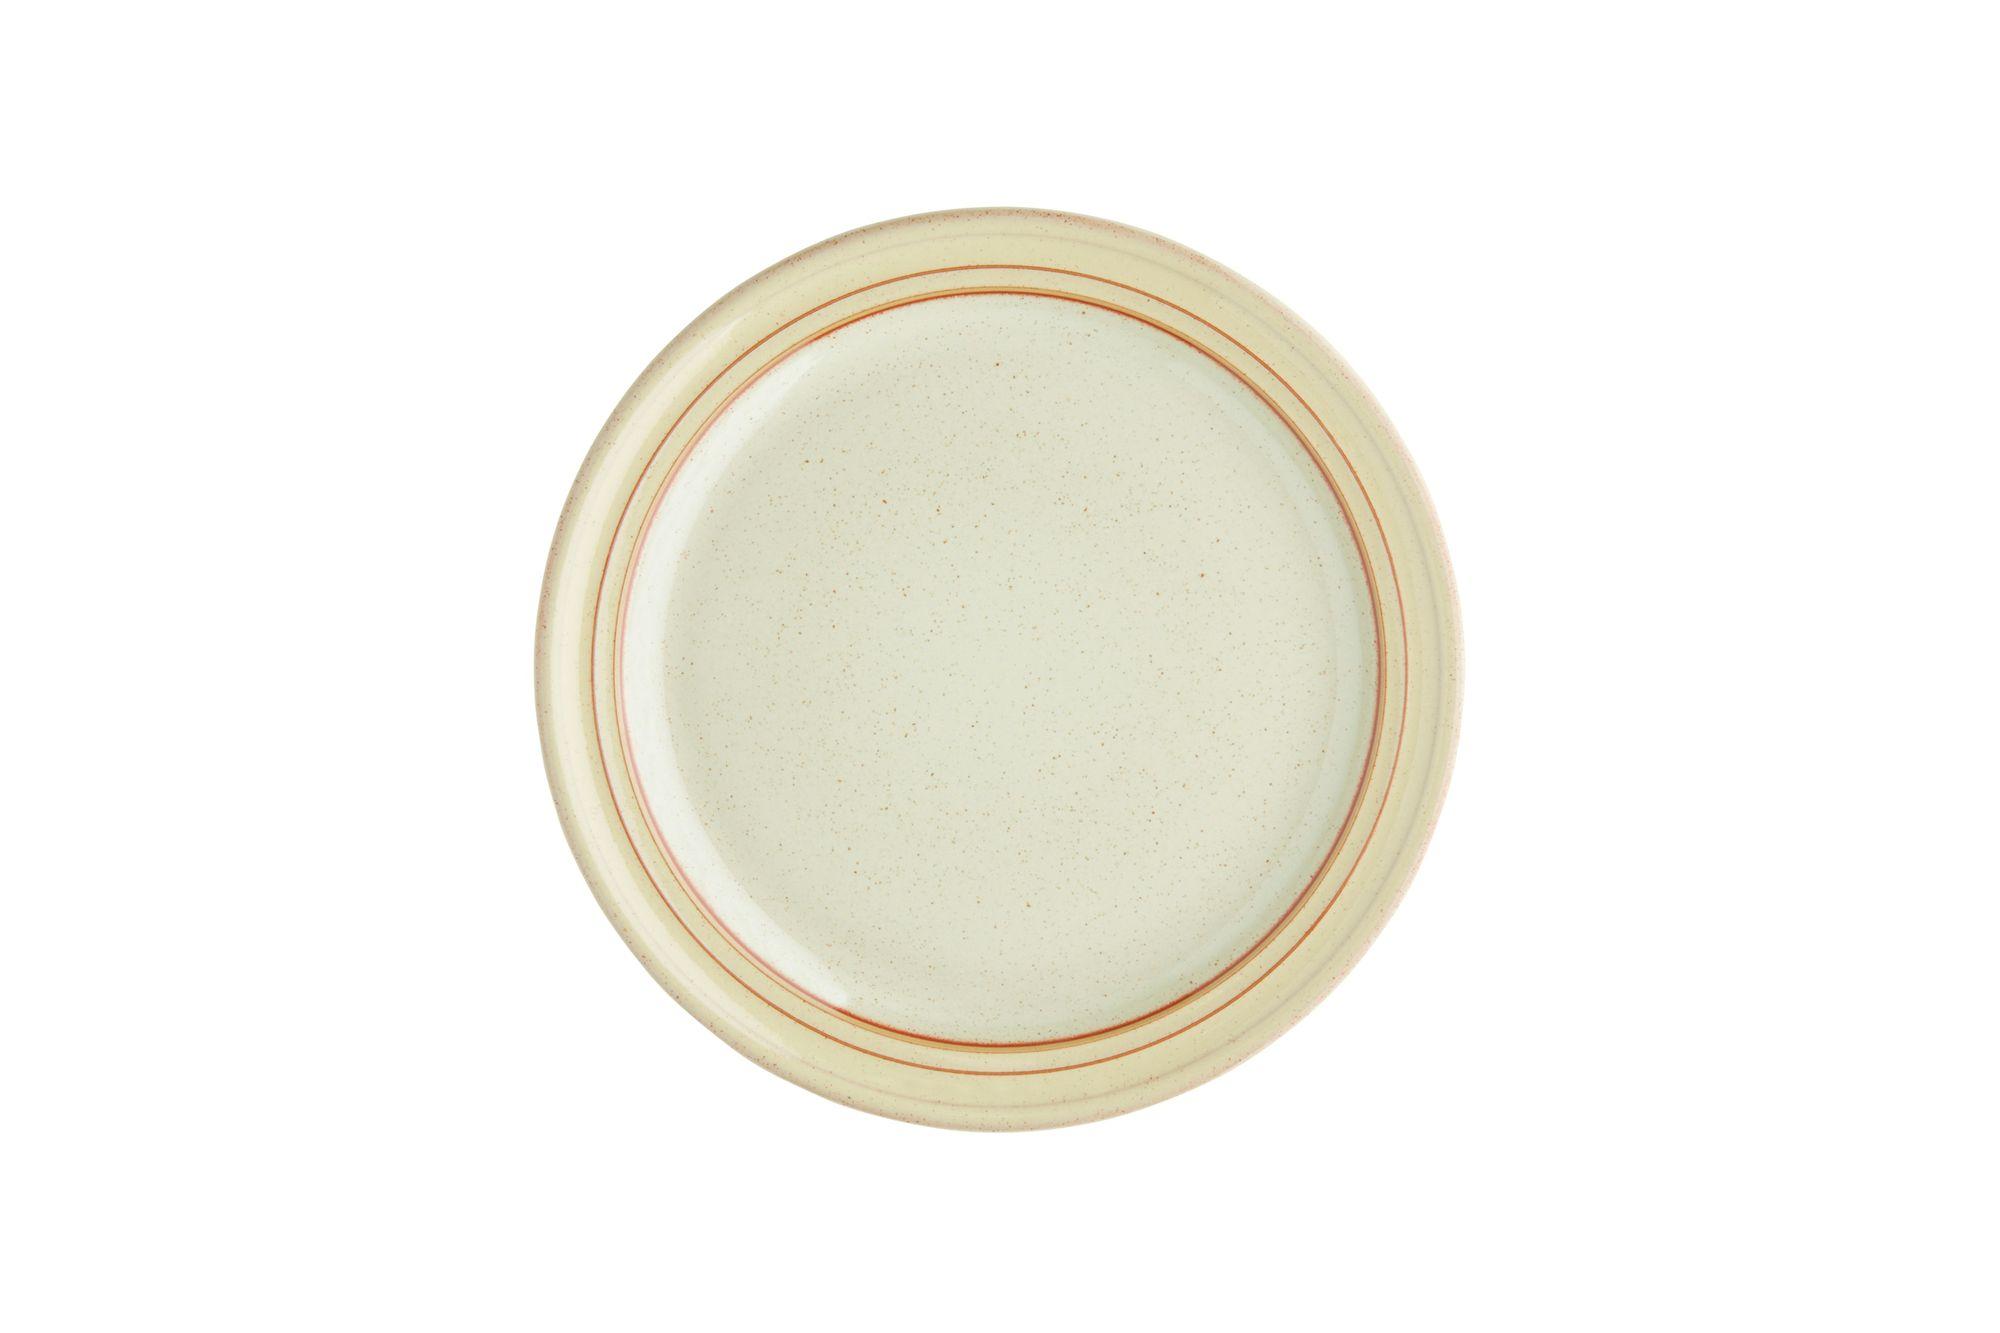 Denby Heritage Veranda Tea Plate 18cm thumb 1